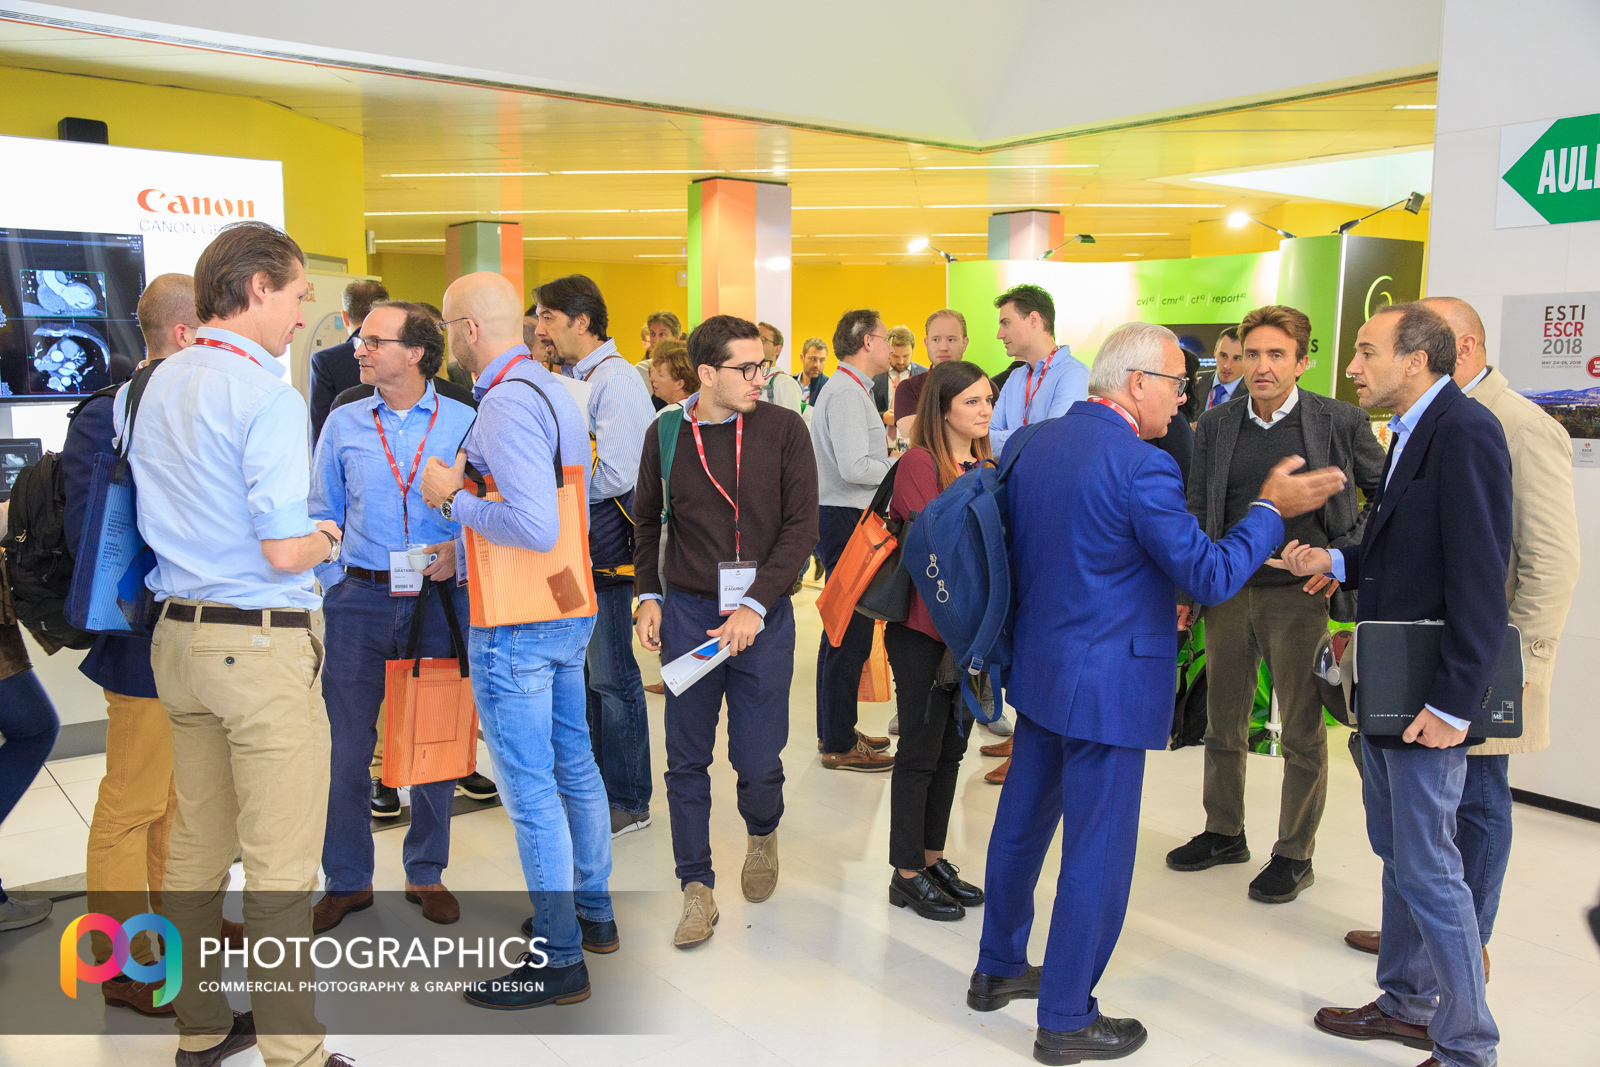 ESCR-2018-conference-event-photography-UK-glasgow-edinburgh-8.jpg